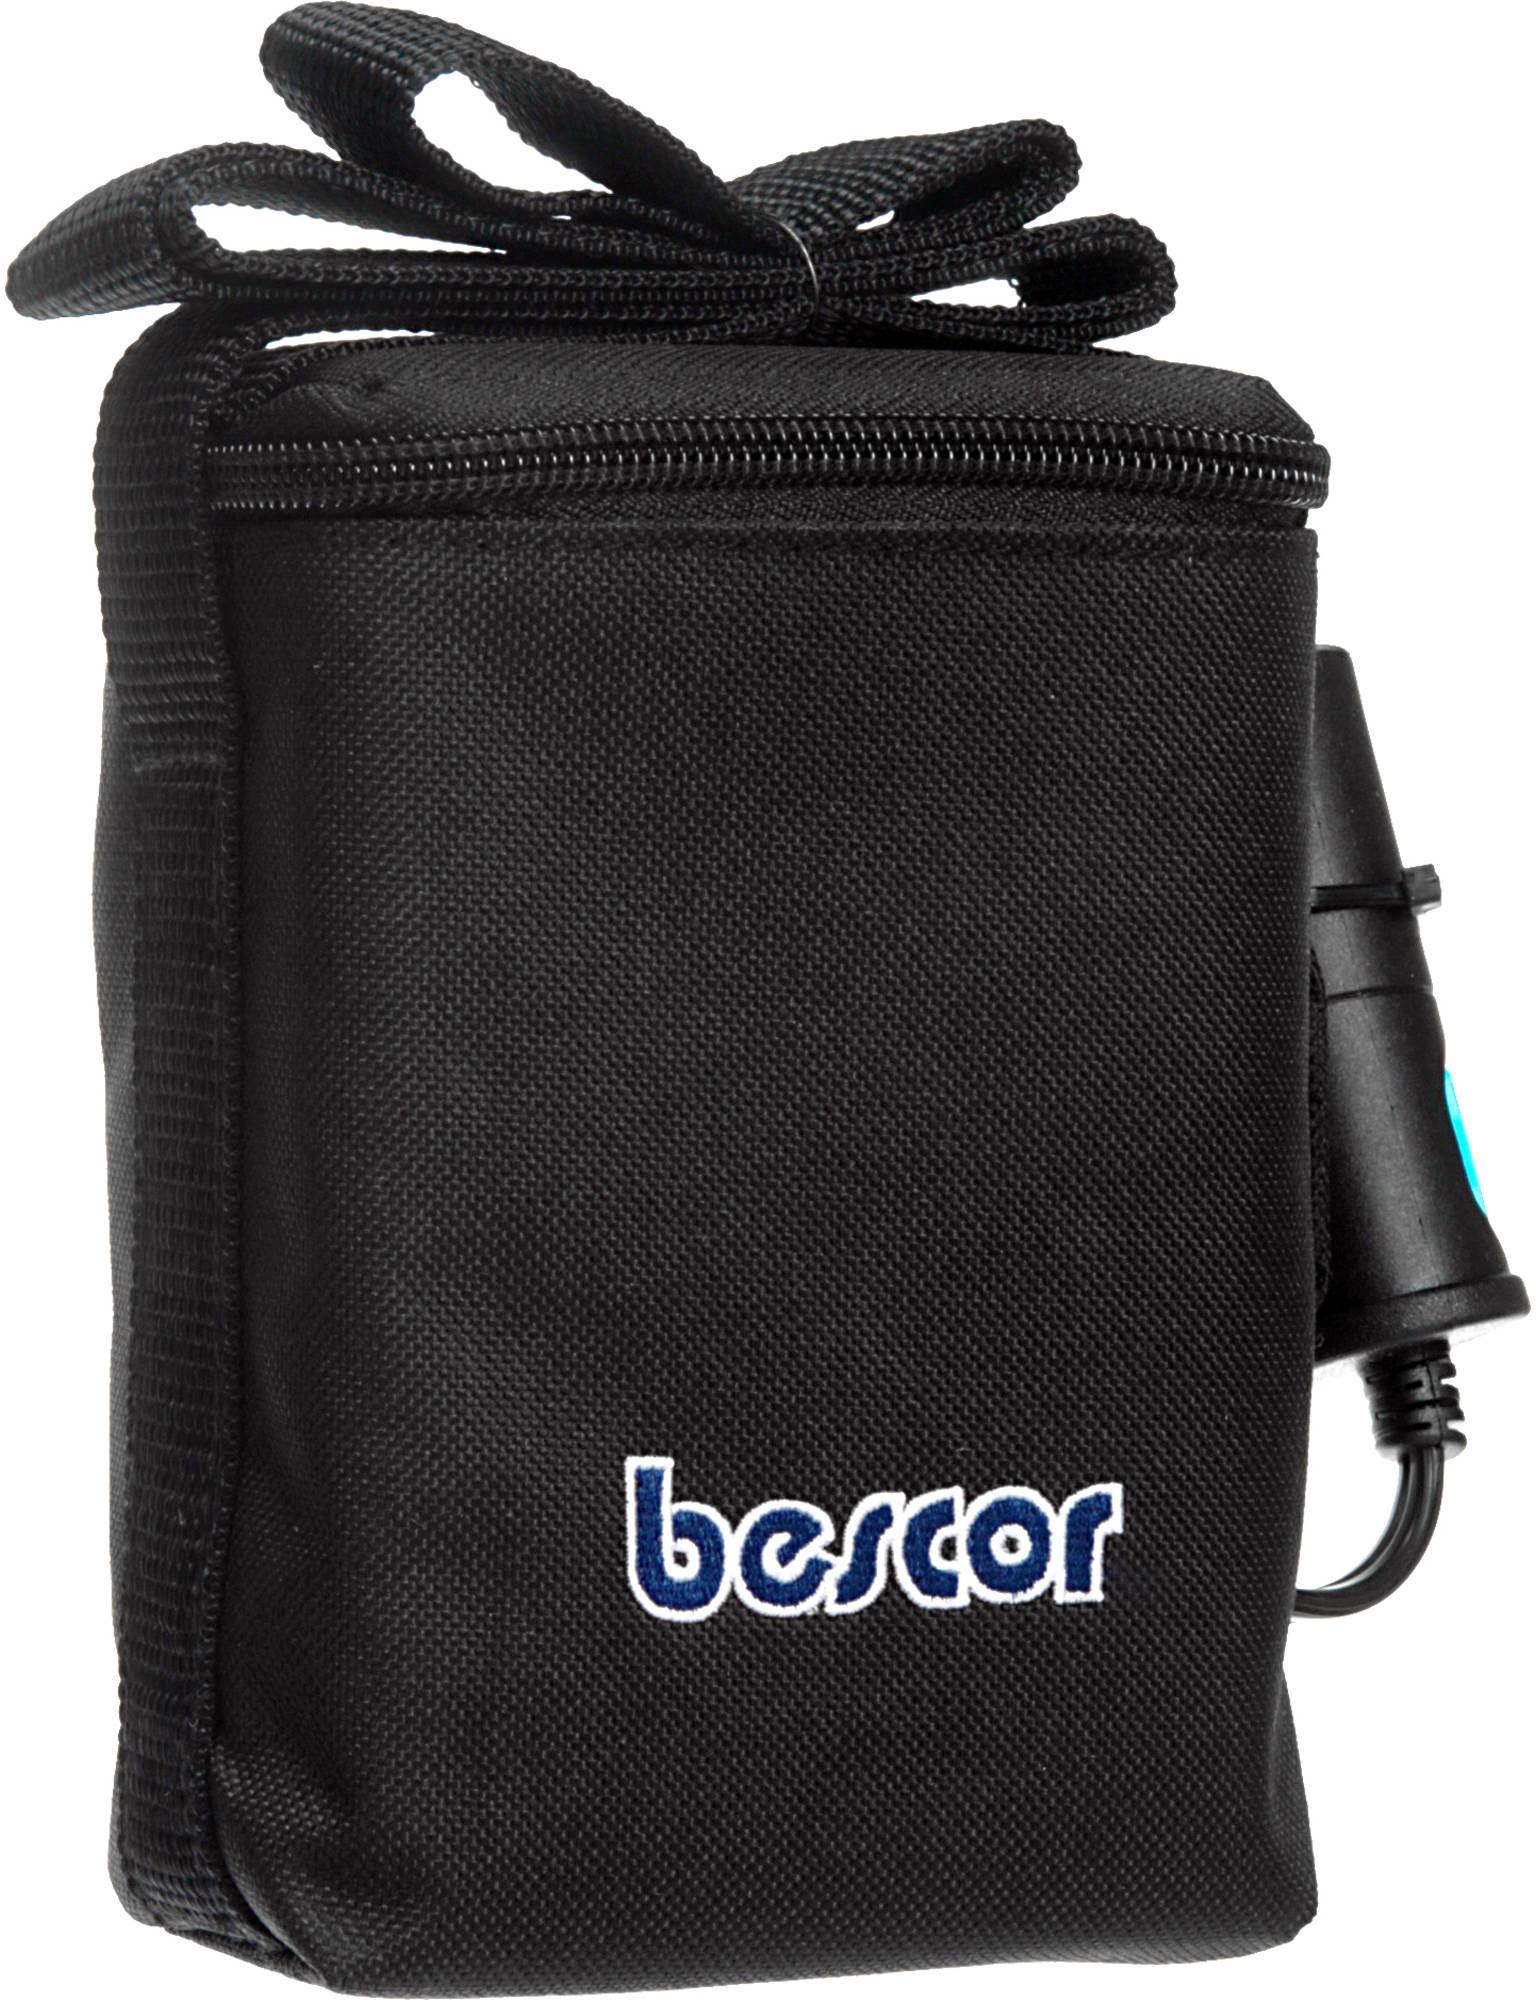 Bescor MM-7NC Shoulder Battery No Charger MM-7NC